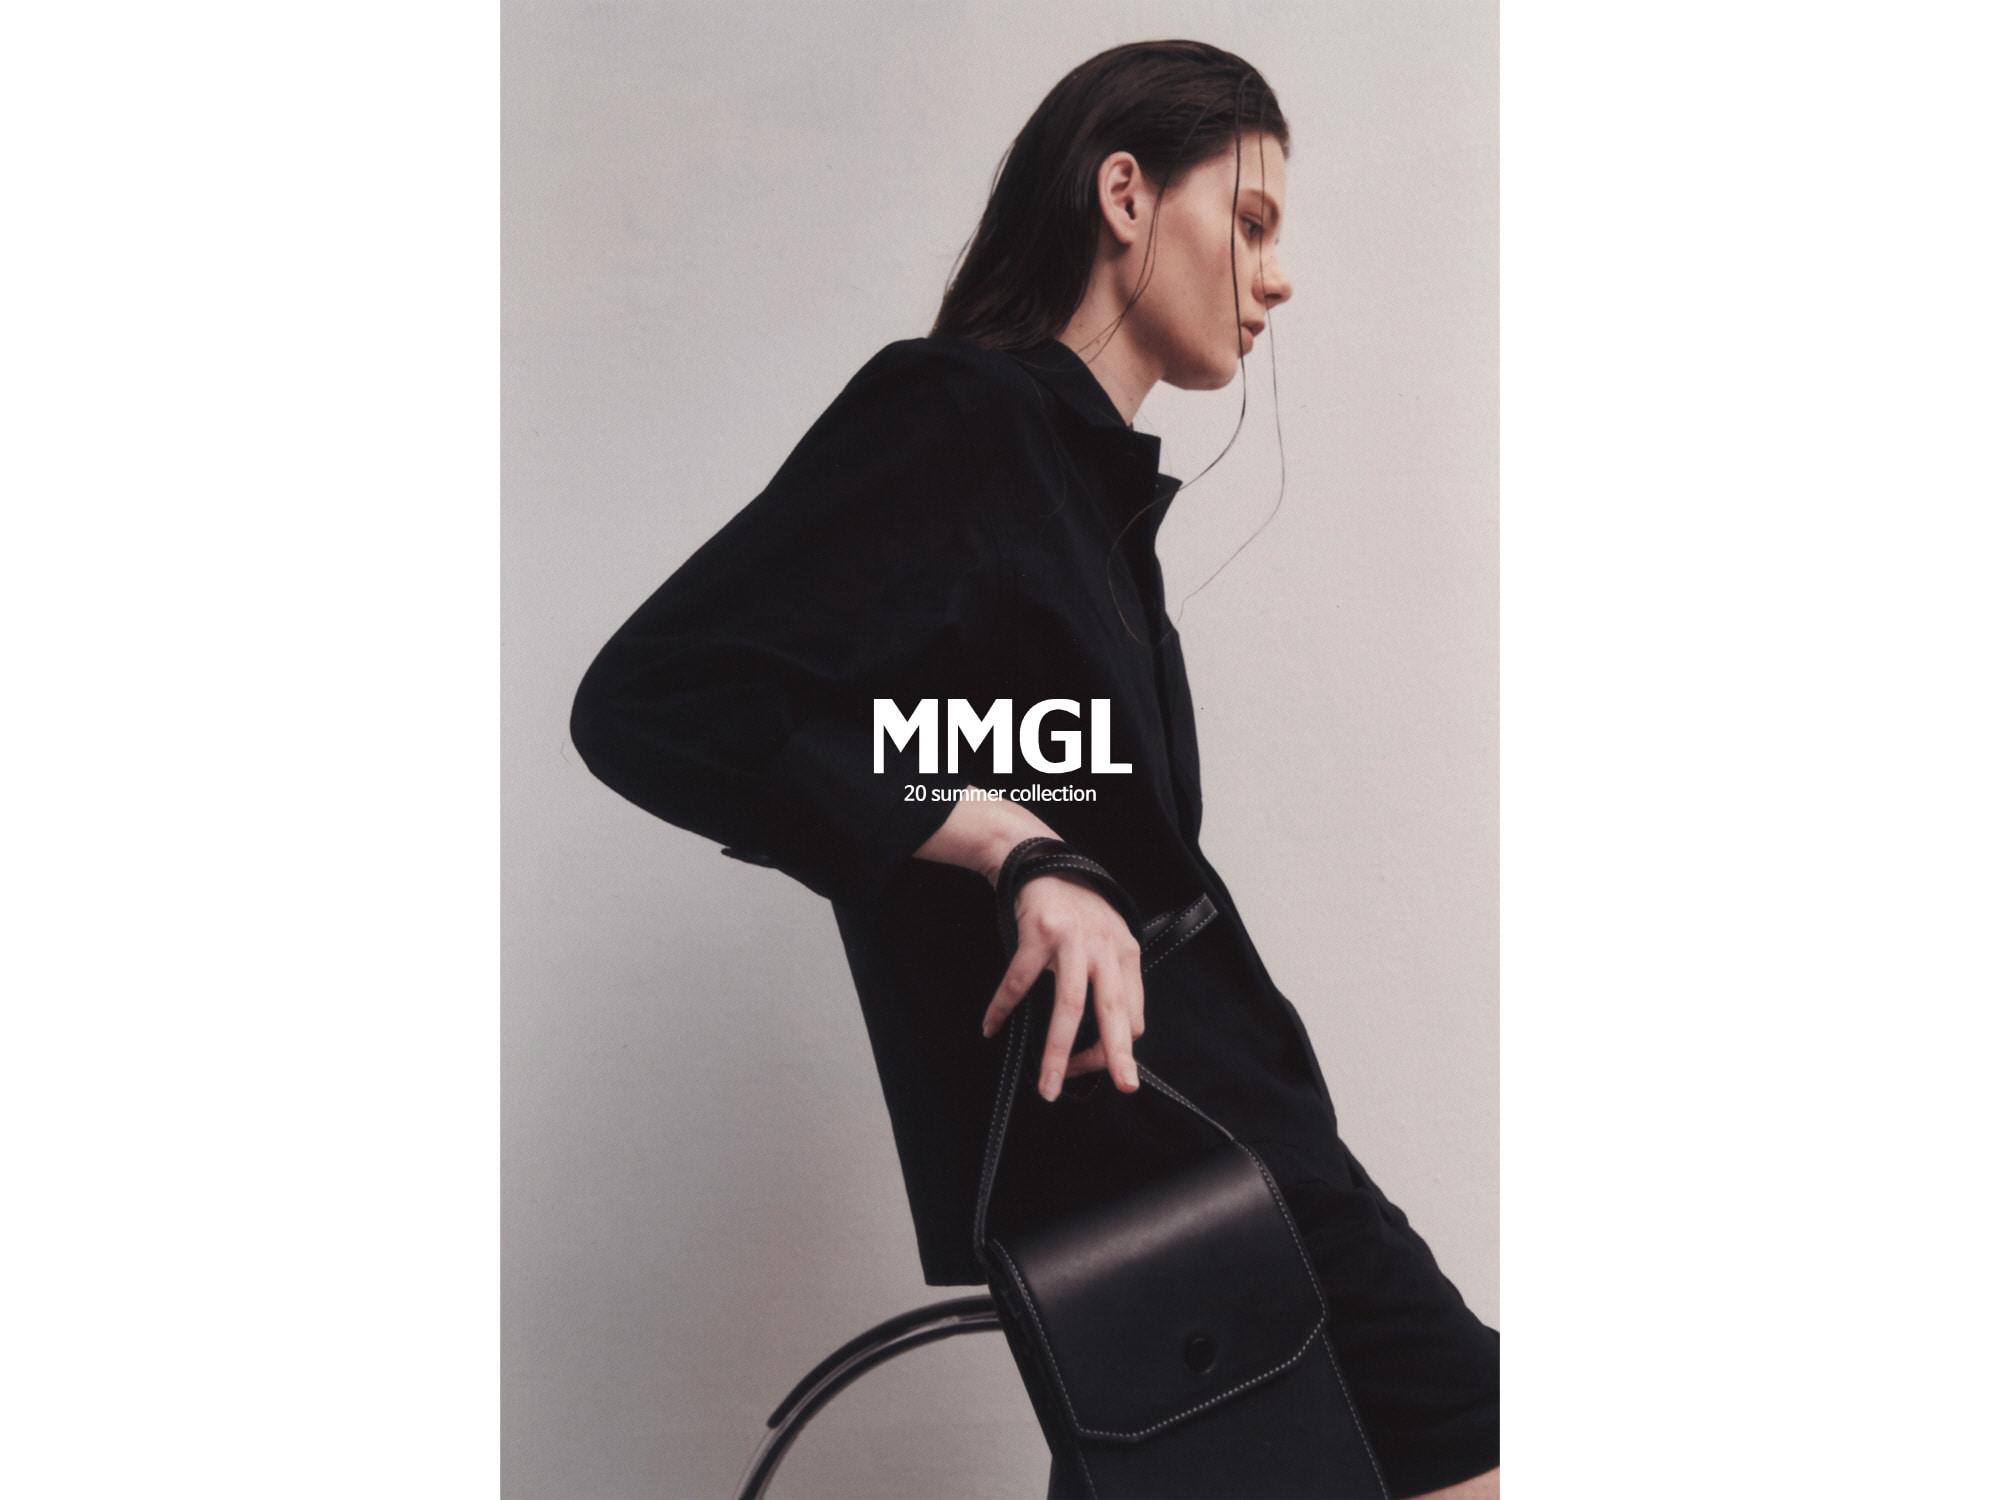 MMGL minimalgarmentslab